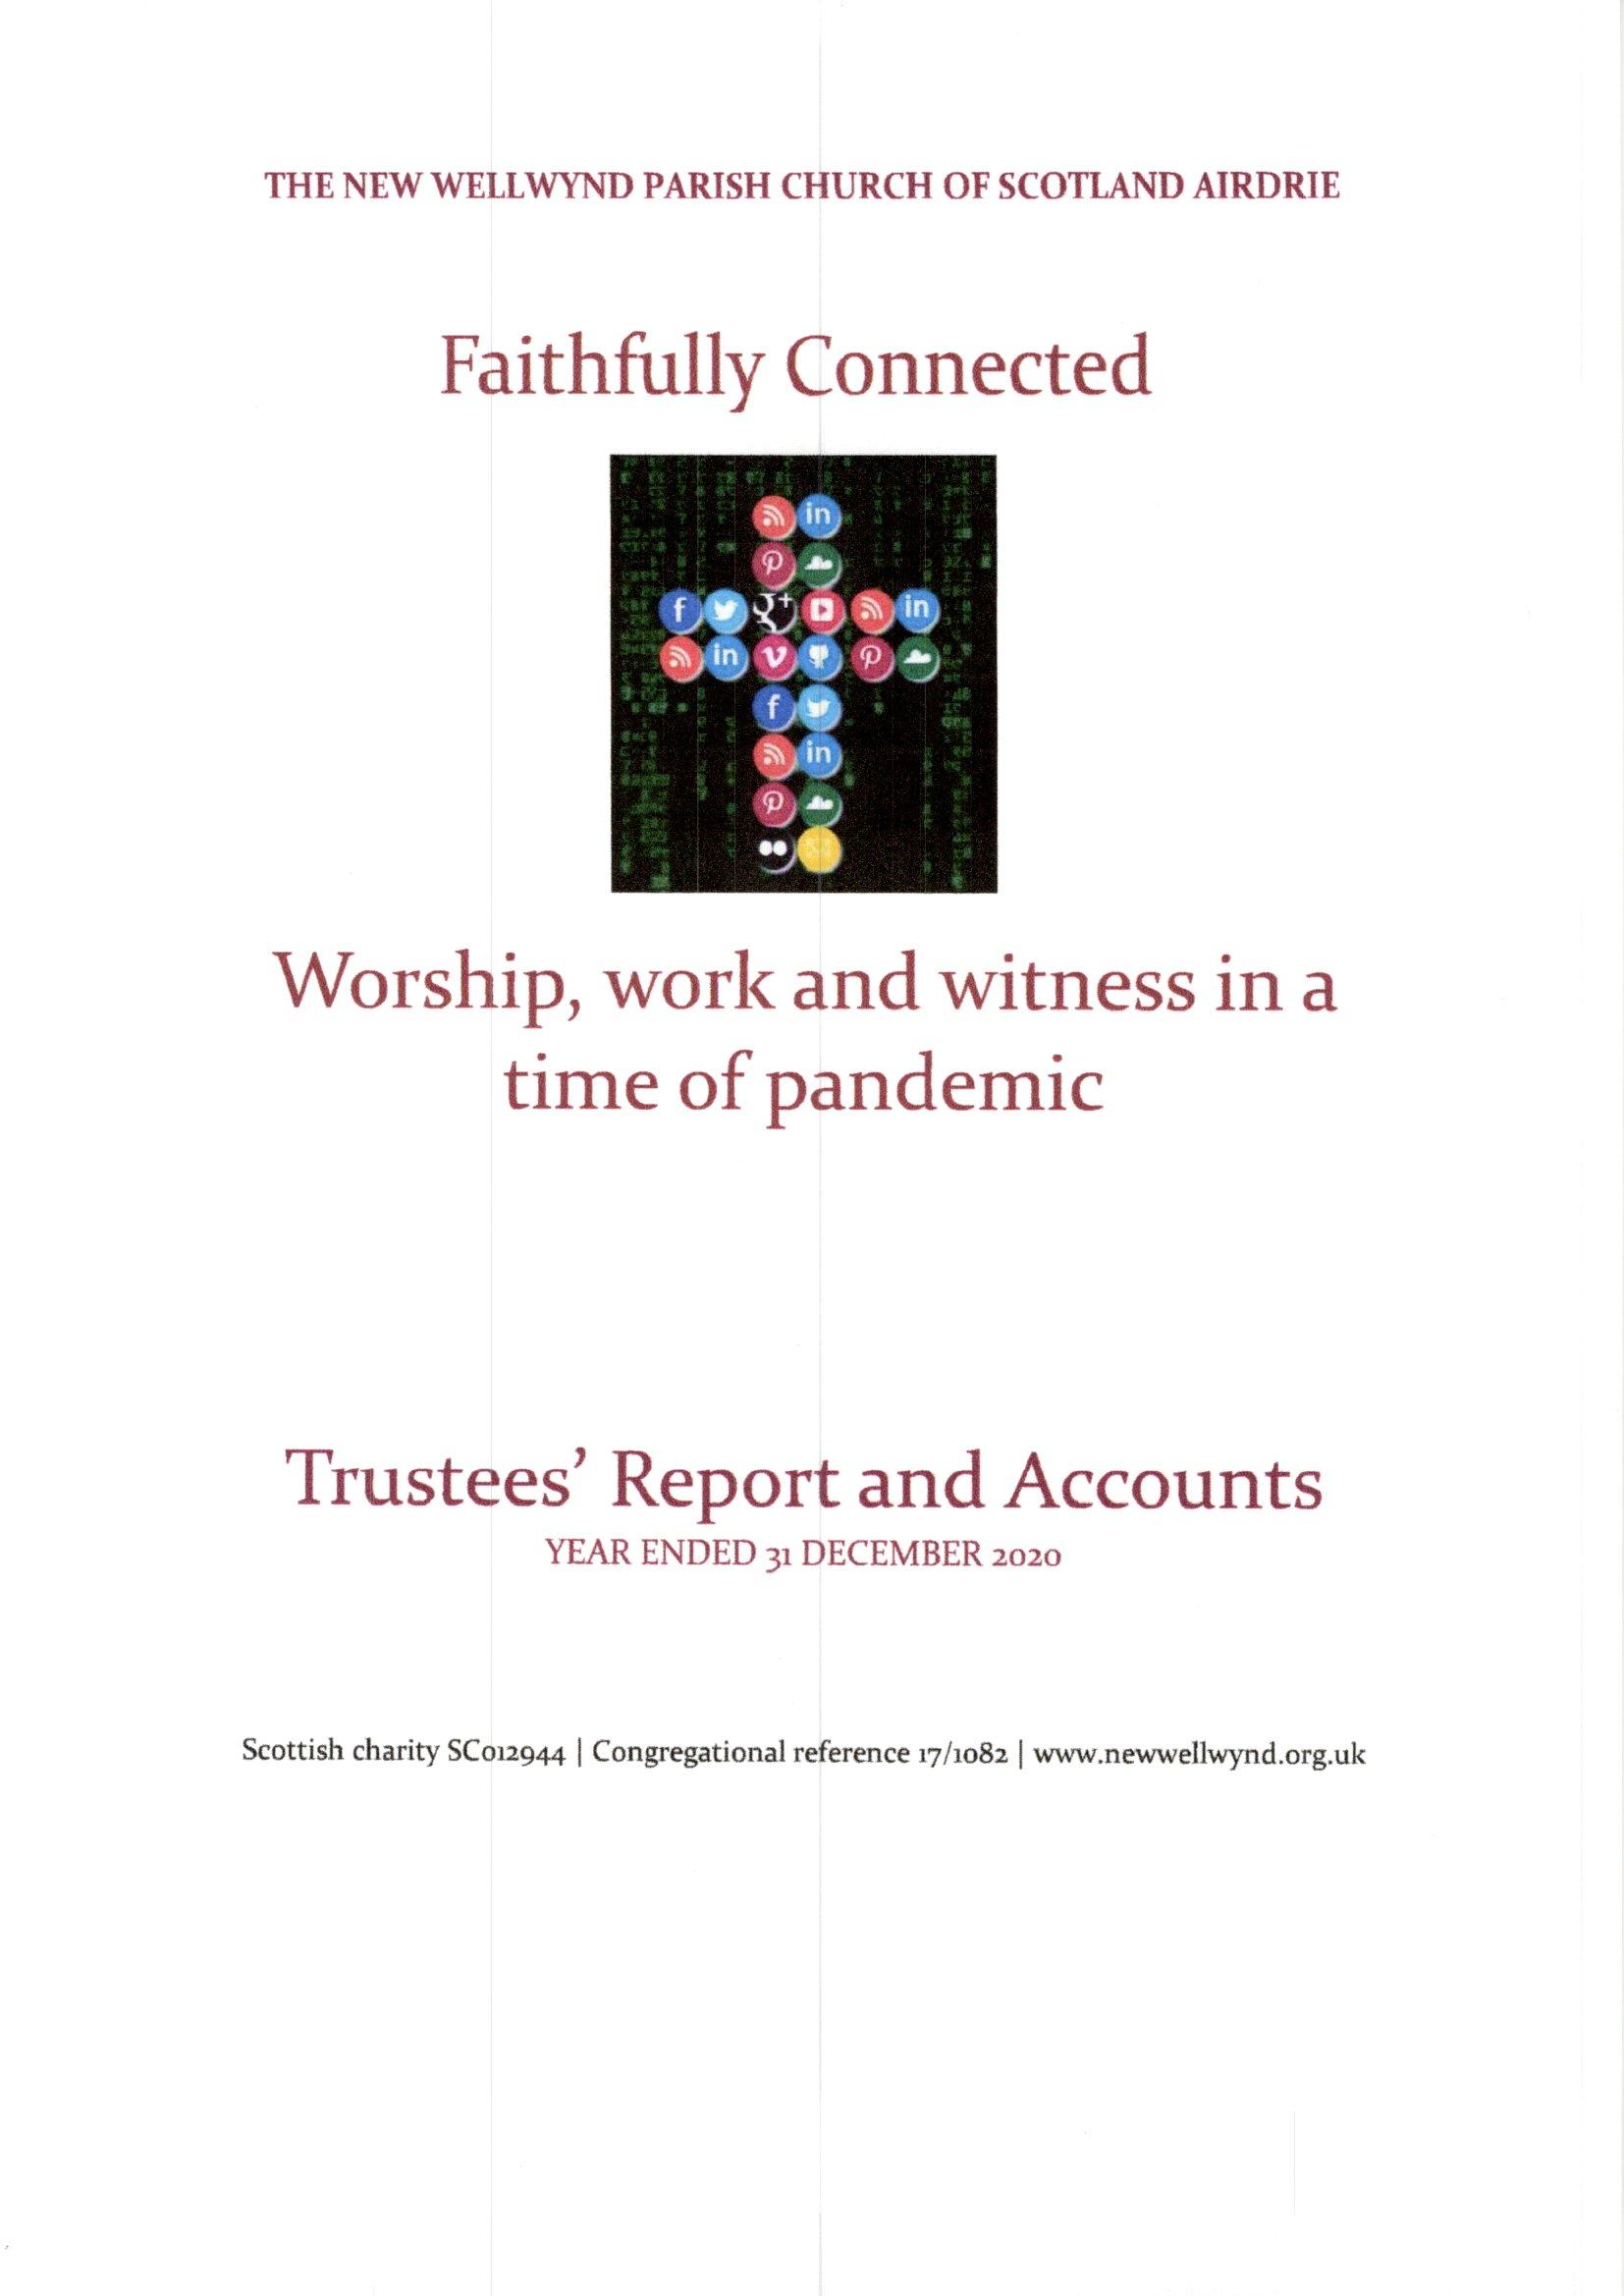 Trustees' Report & Accounts 2020